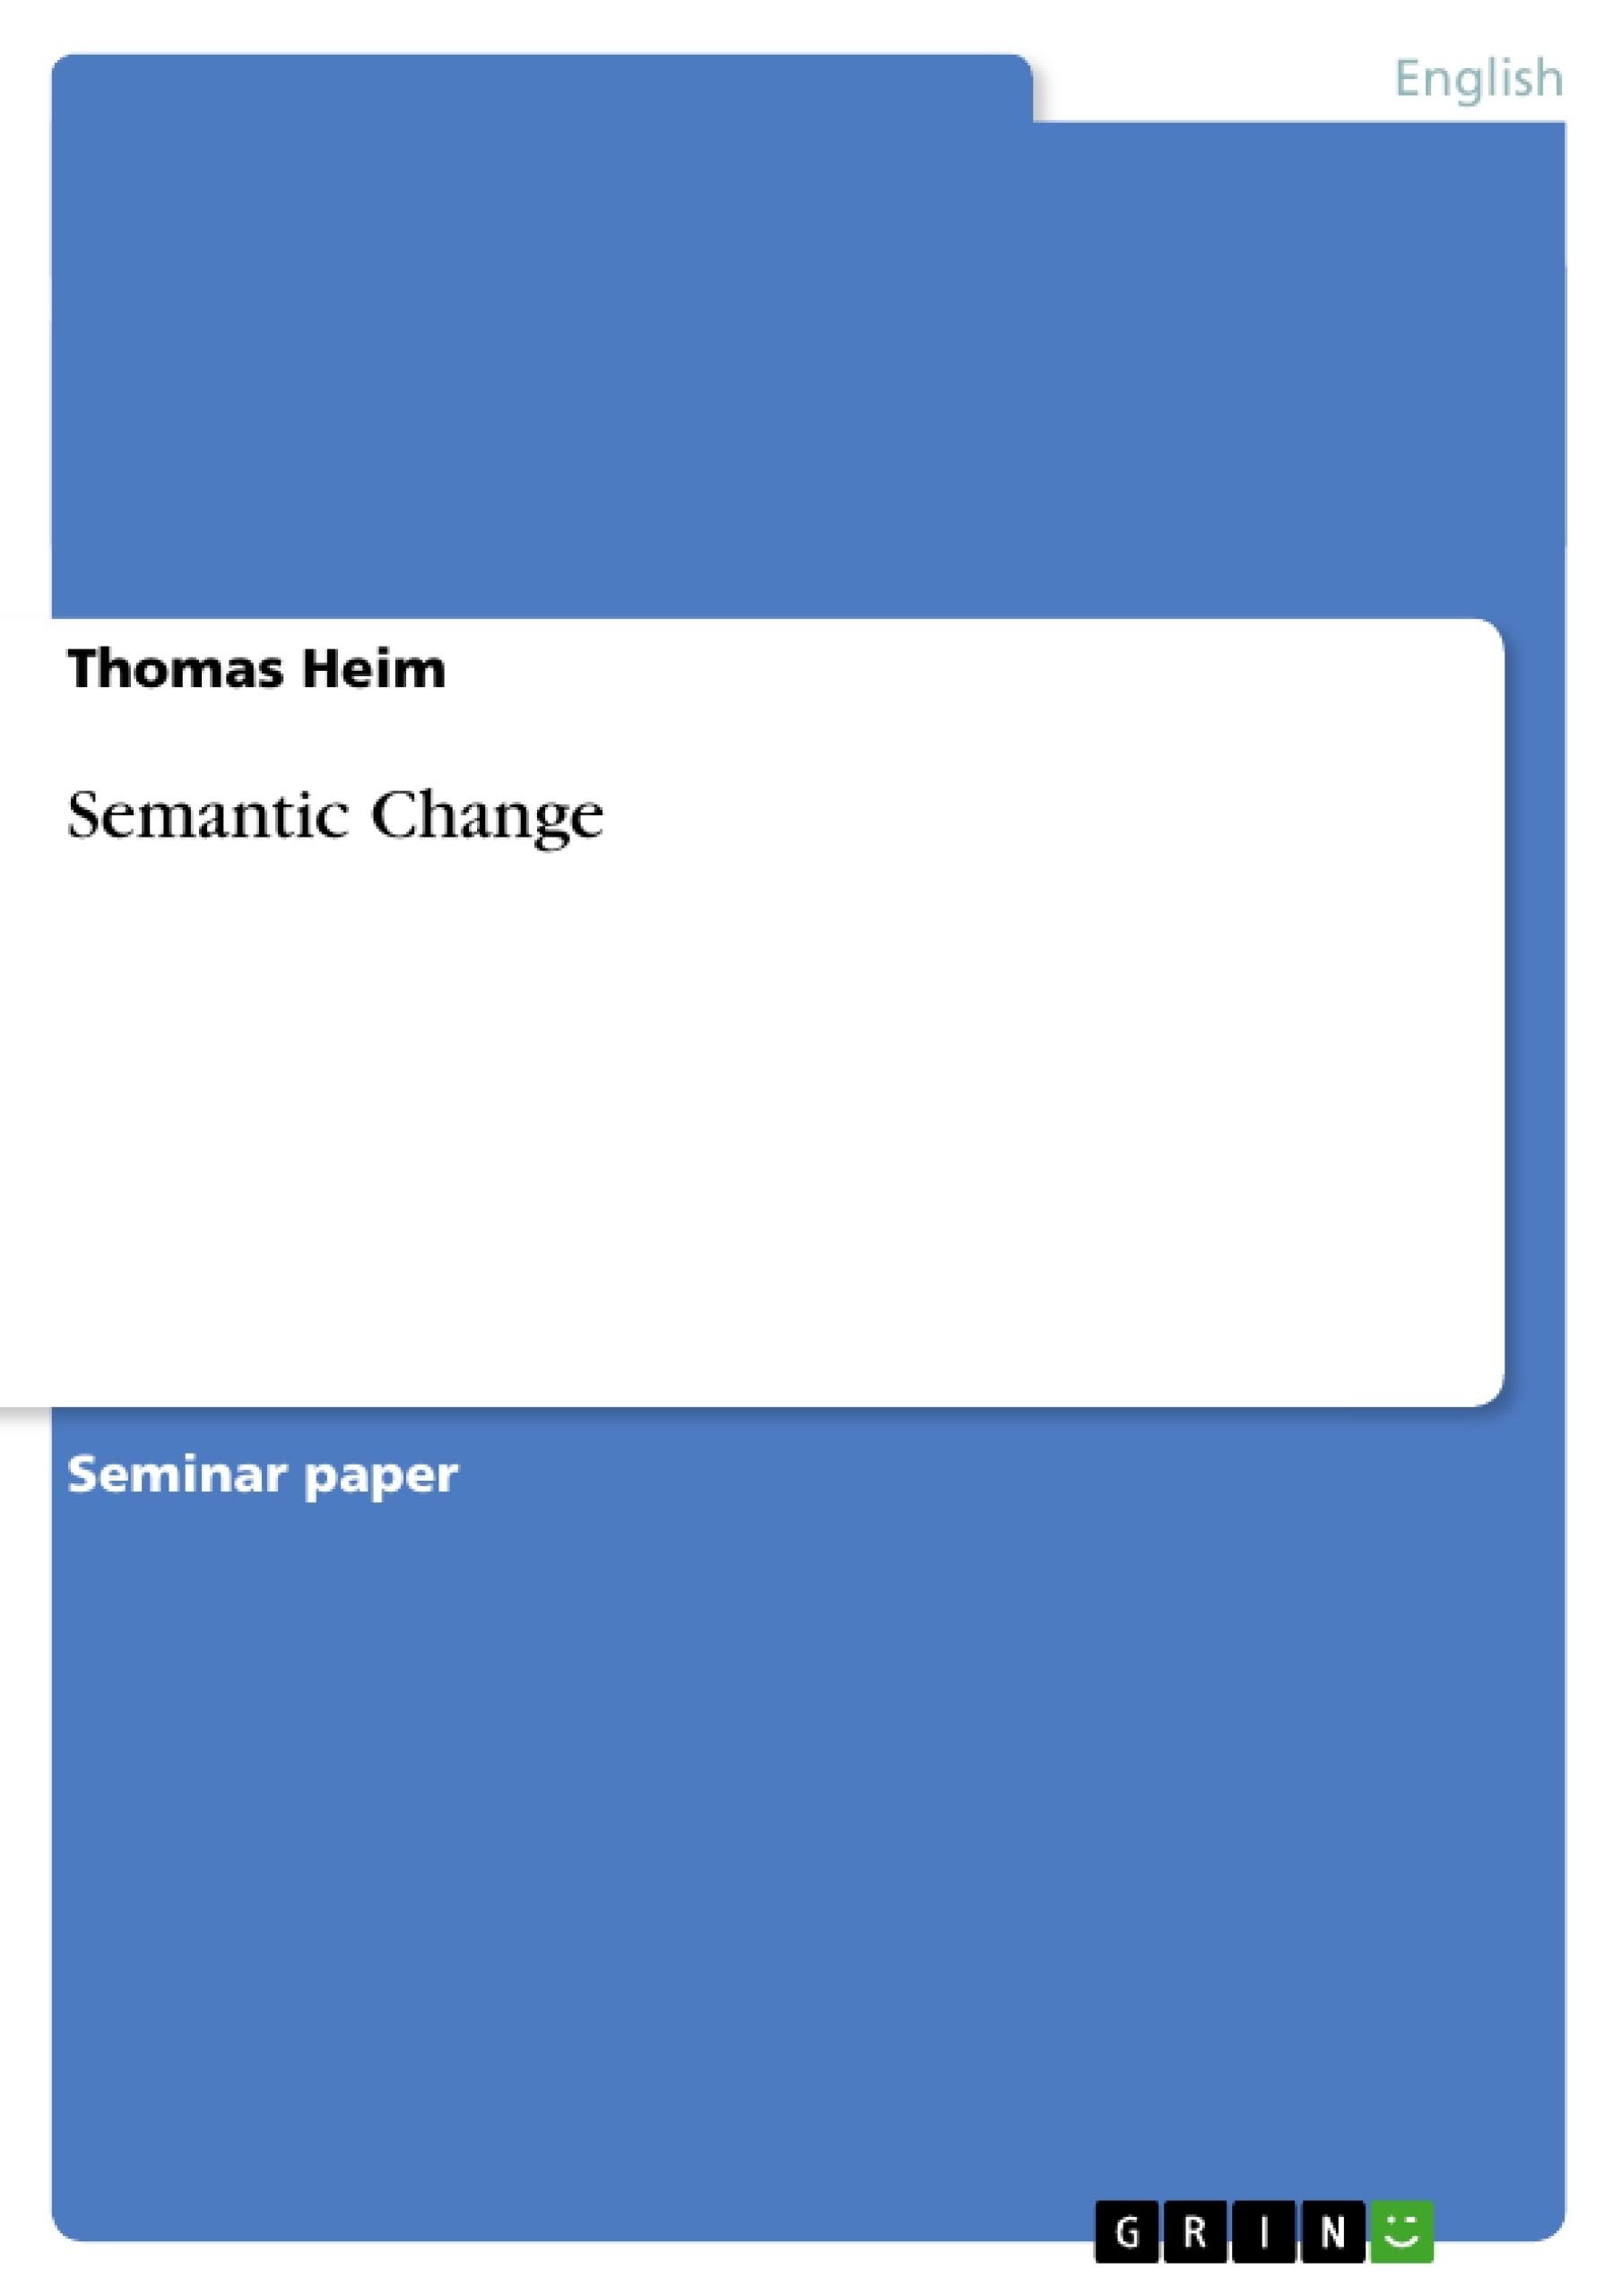 Title: Semantic Change